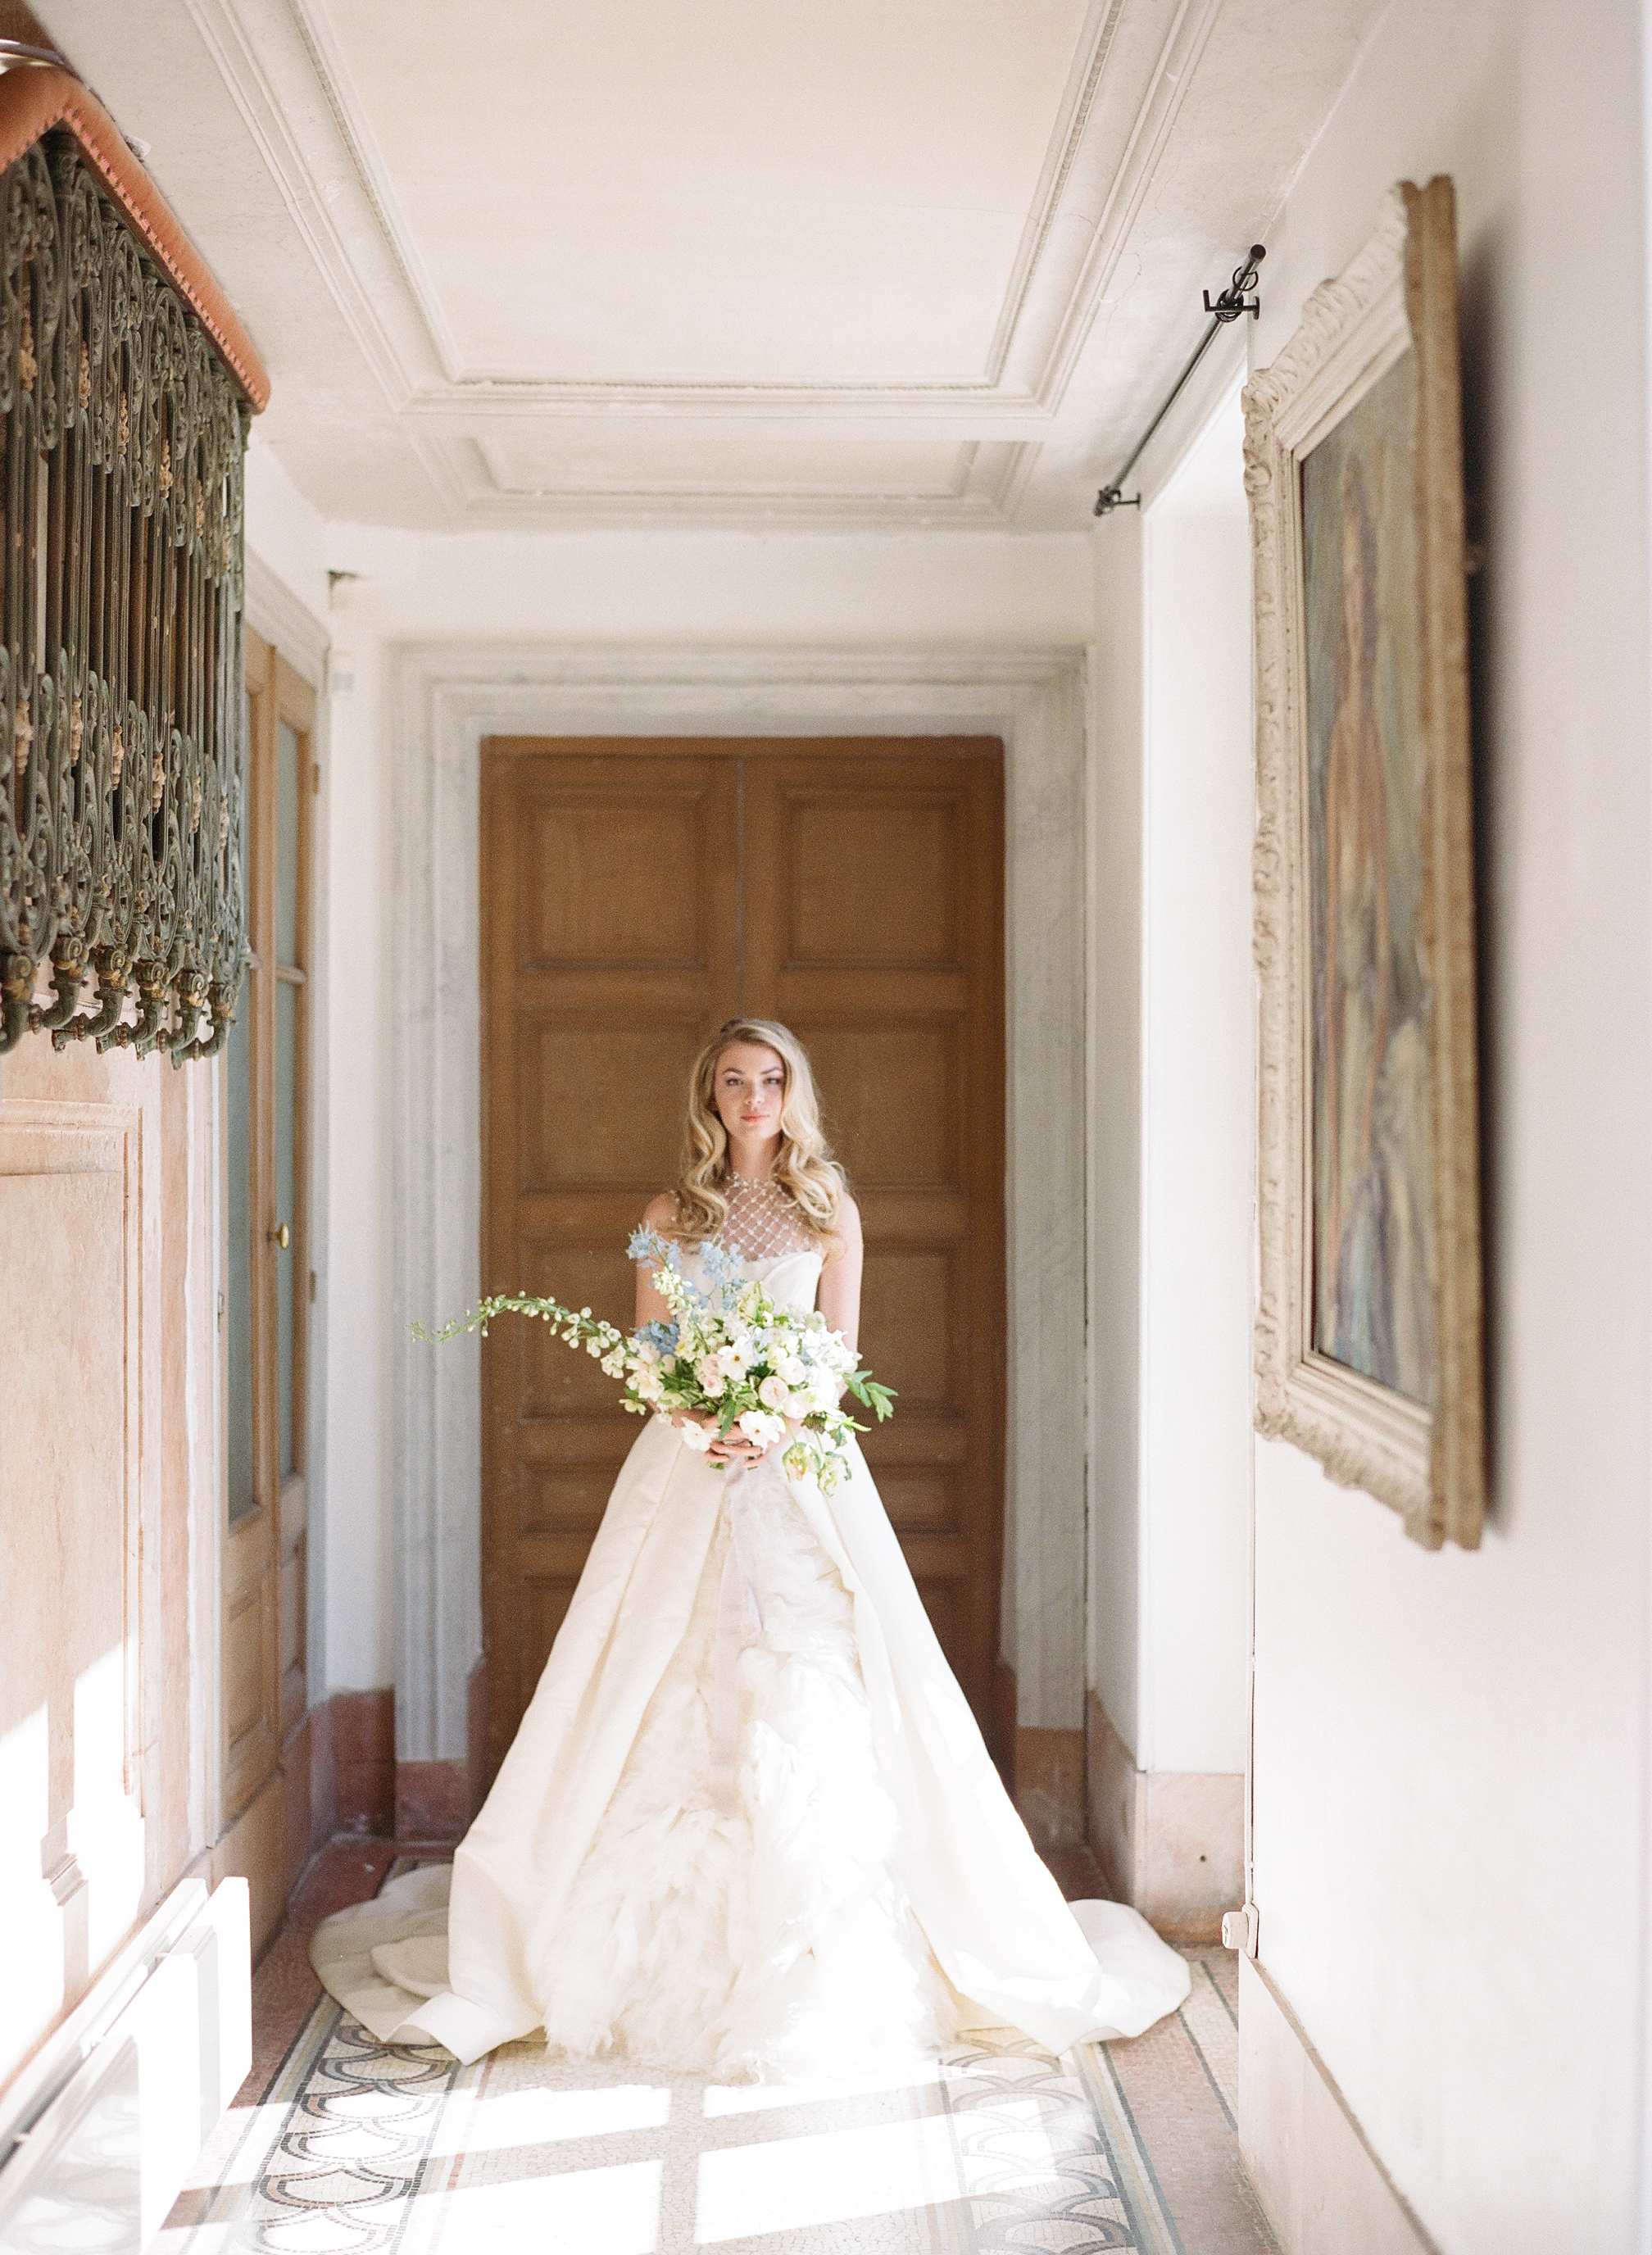 Sylvie-Gil-film-destination-wedding-photography-2017-workshop-chateau-de-varennes-masquerade-burgundy-france-bride-bouquet